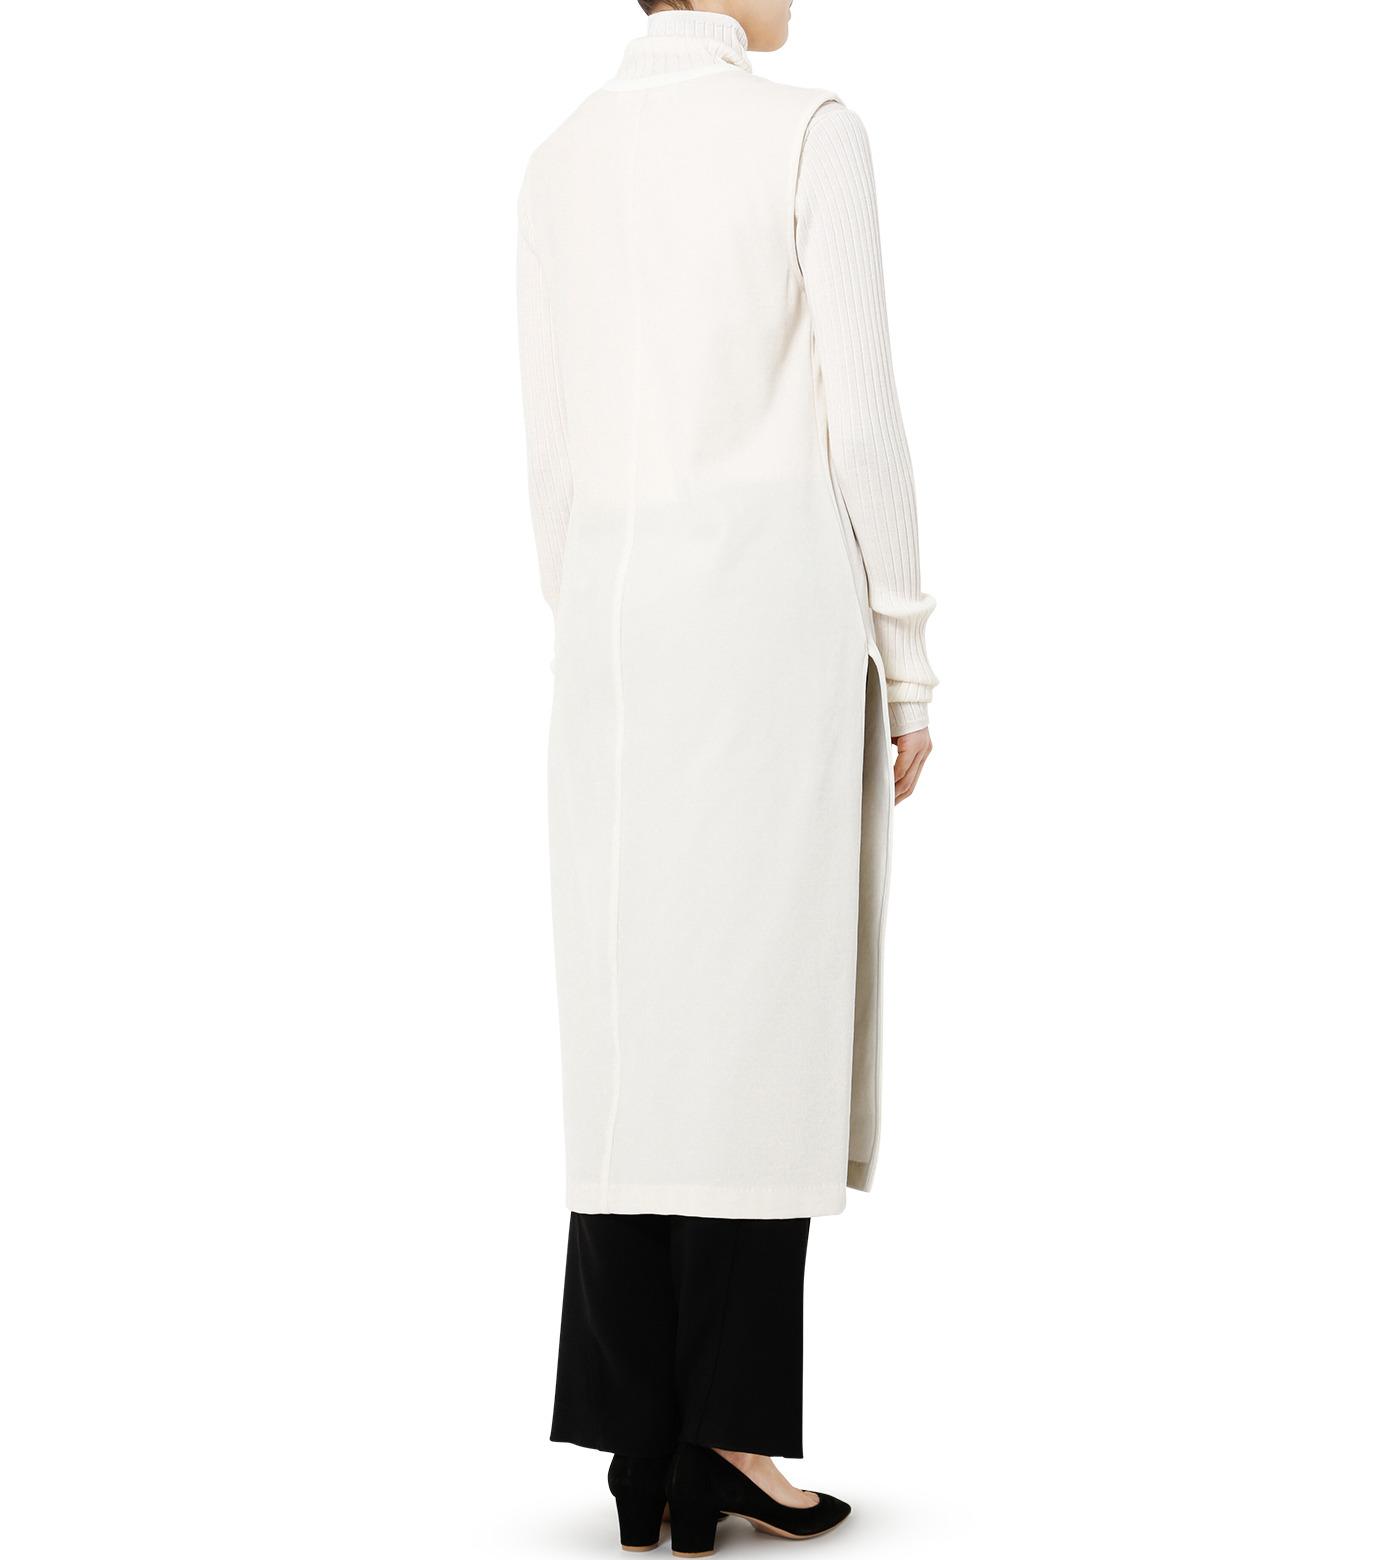 LE CIEL BLEU(ルシェルブルー)のベロアチュニックドレス-WHITE(トップス/tops)-19S62102 拡大詳細画像4